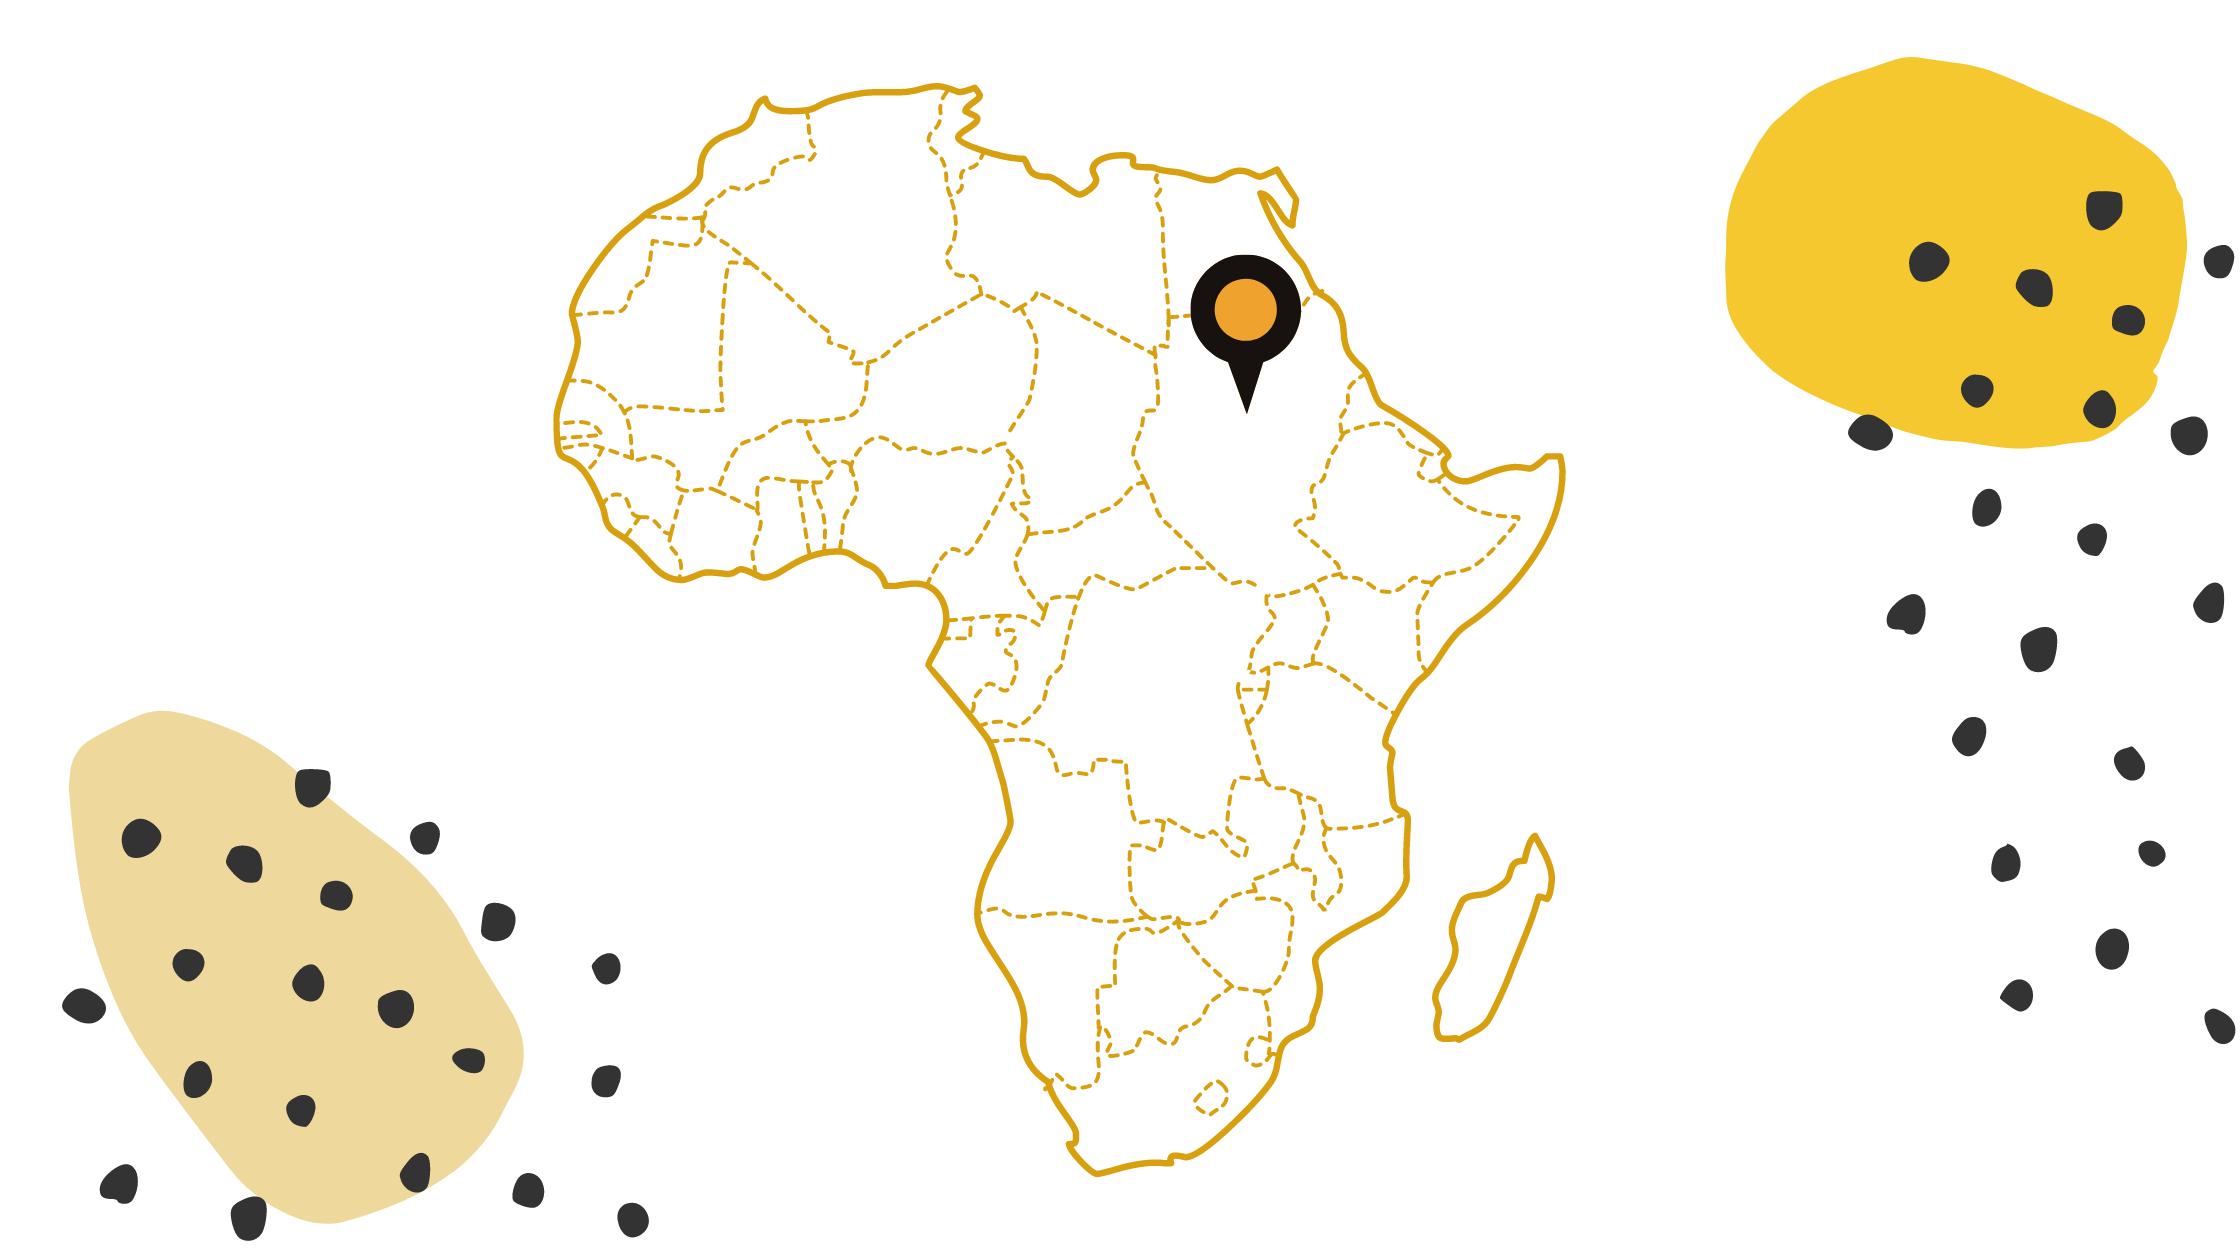 North Sudan Map